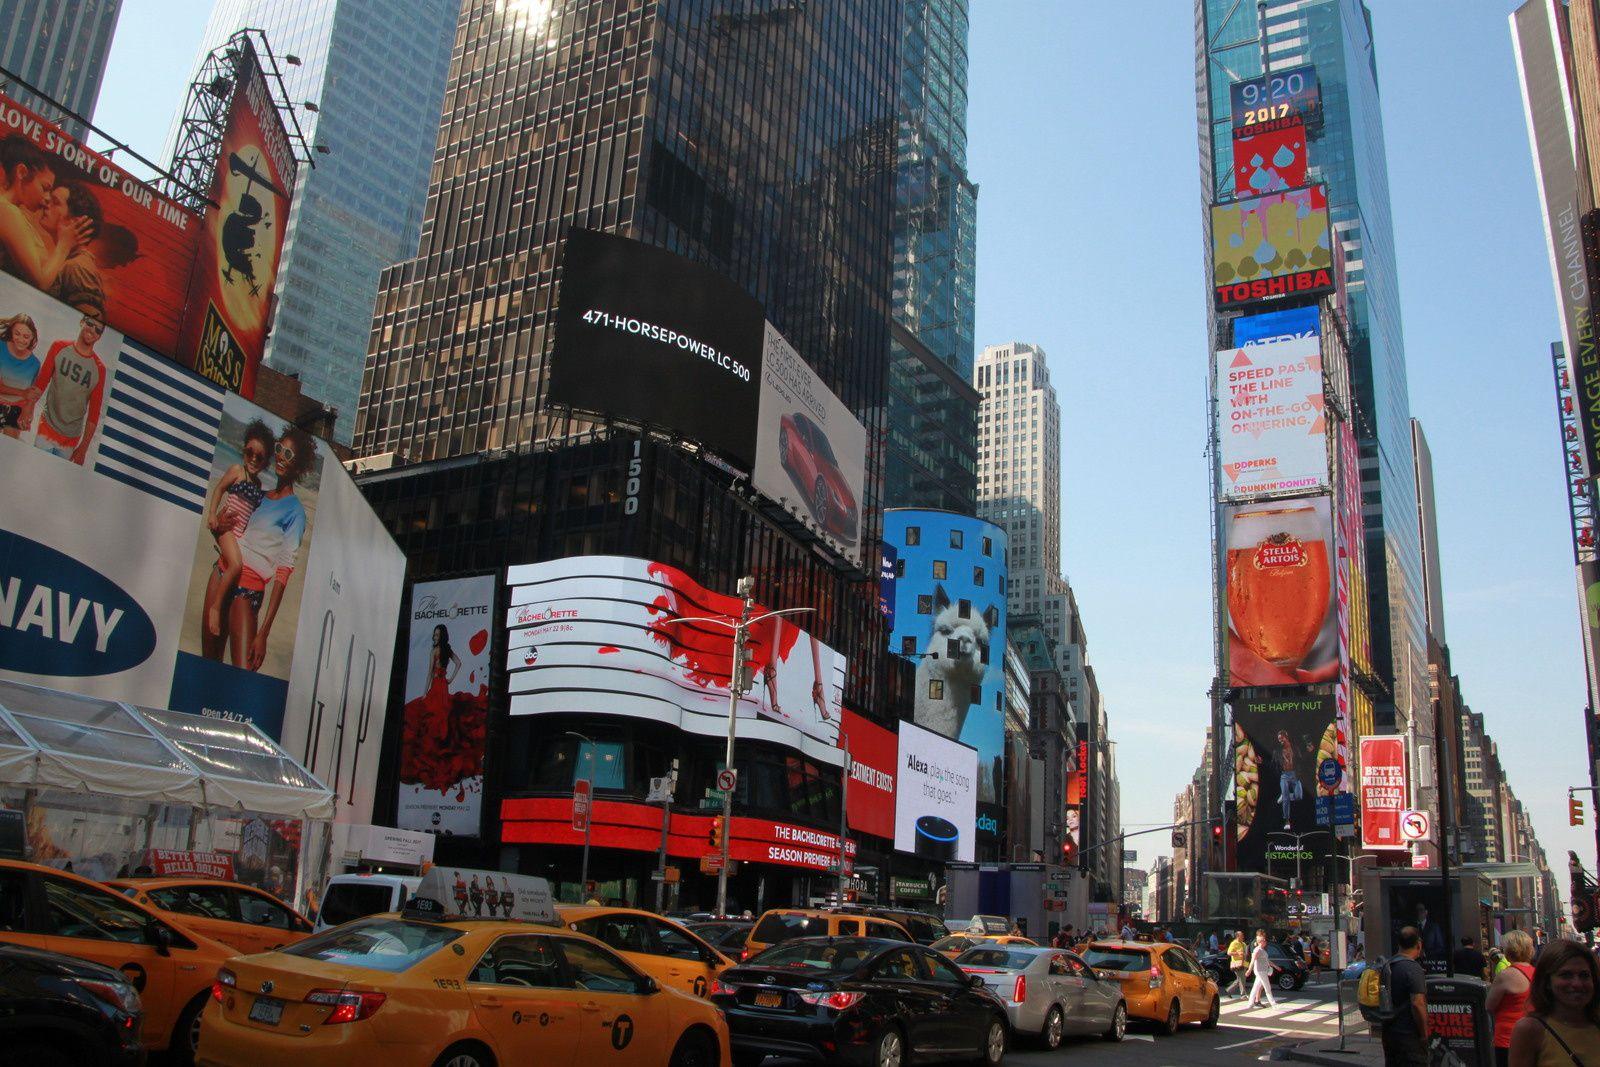 Times Square et quartier des thêatres...NYC by night